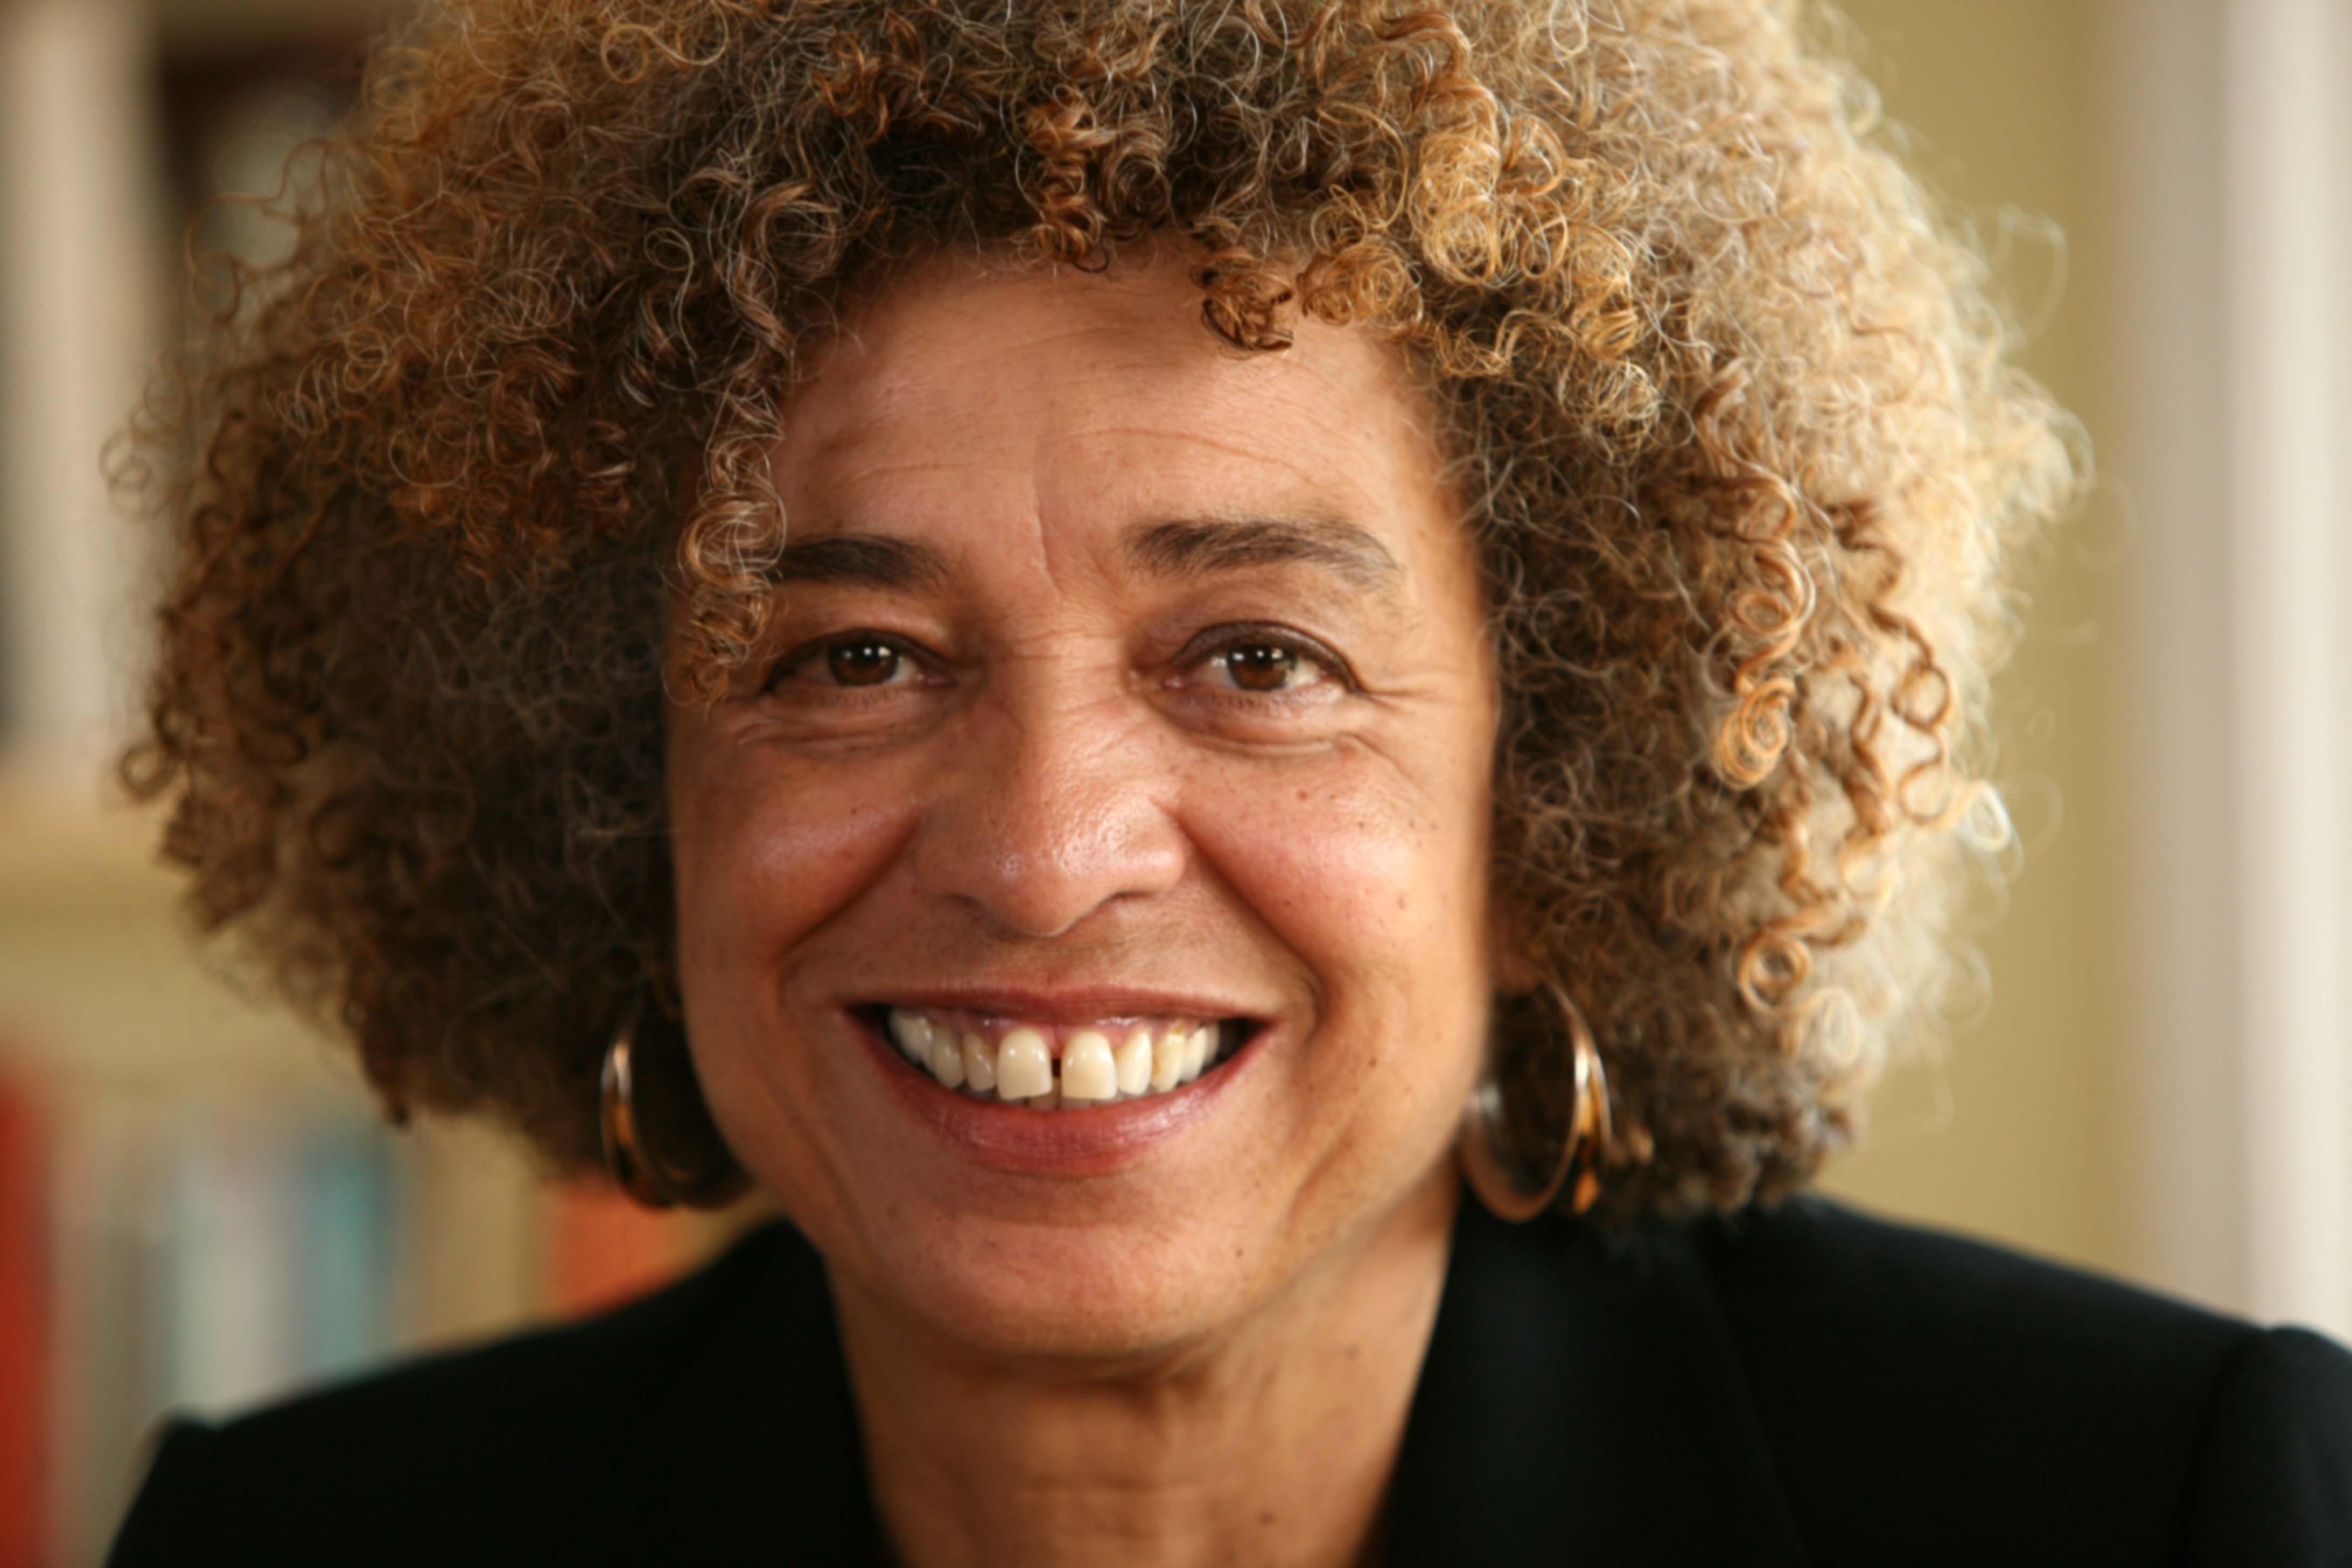 Legendary US Civil Rights Activist headlines International Women's Day